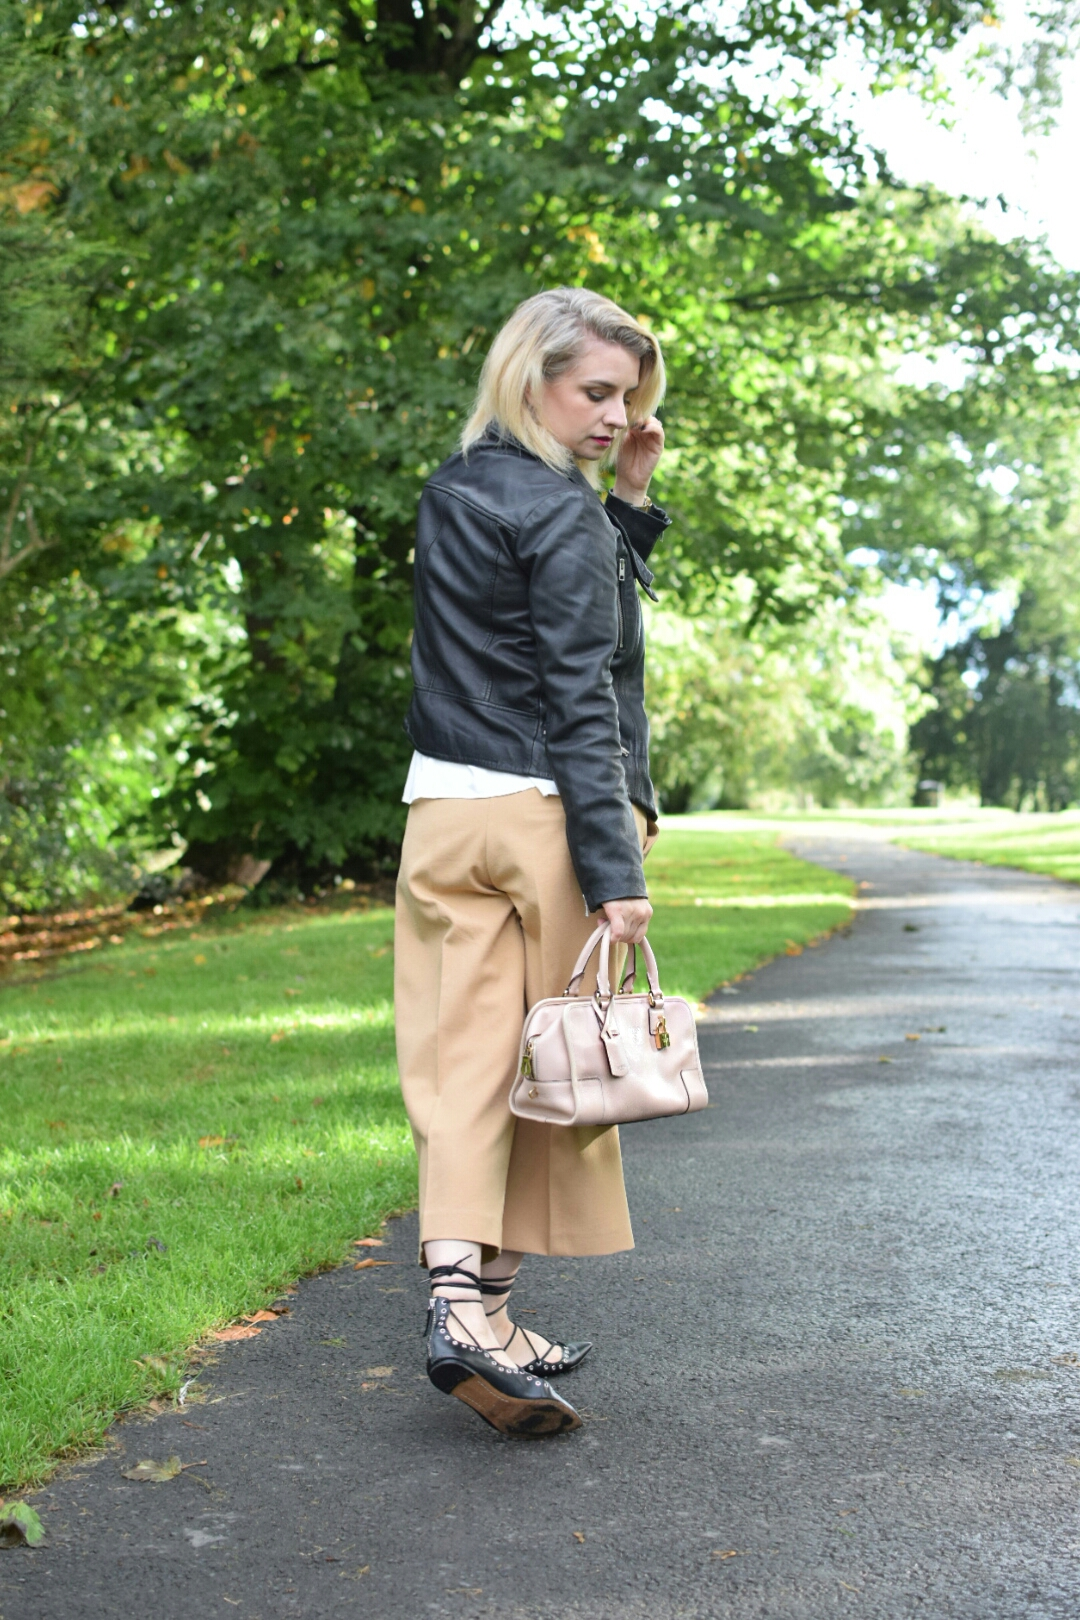 All saints Leather jacket, Peasant white blouse,River Island Camel Culottes,Zara Ballet Pumps, Amazona Loewe bag